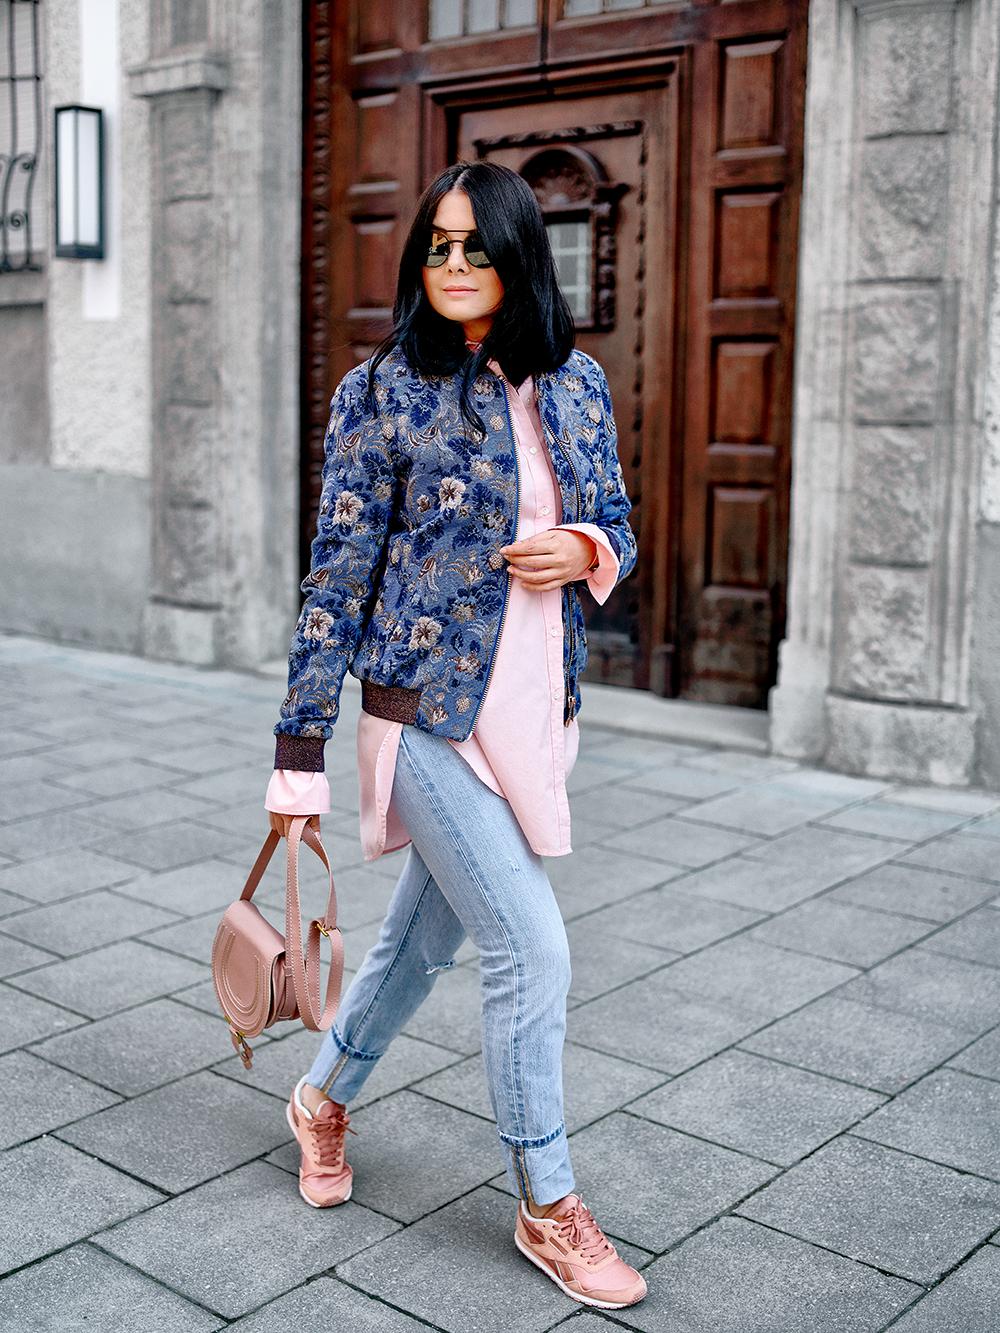 fashionambit-fashionblog-muenchen-modeblog-deutschland-blogger-modeblogger-fashionblogger-bloggerdeutschland-lifestyleblog-munich-style-blog-tragen-bomberjacke